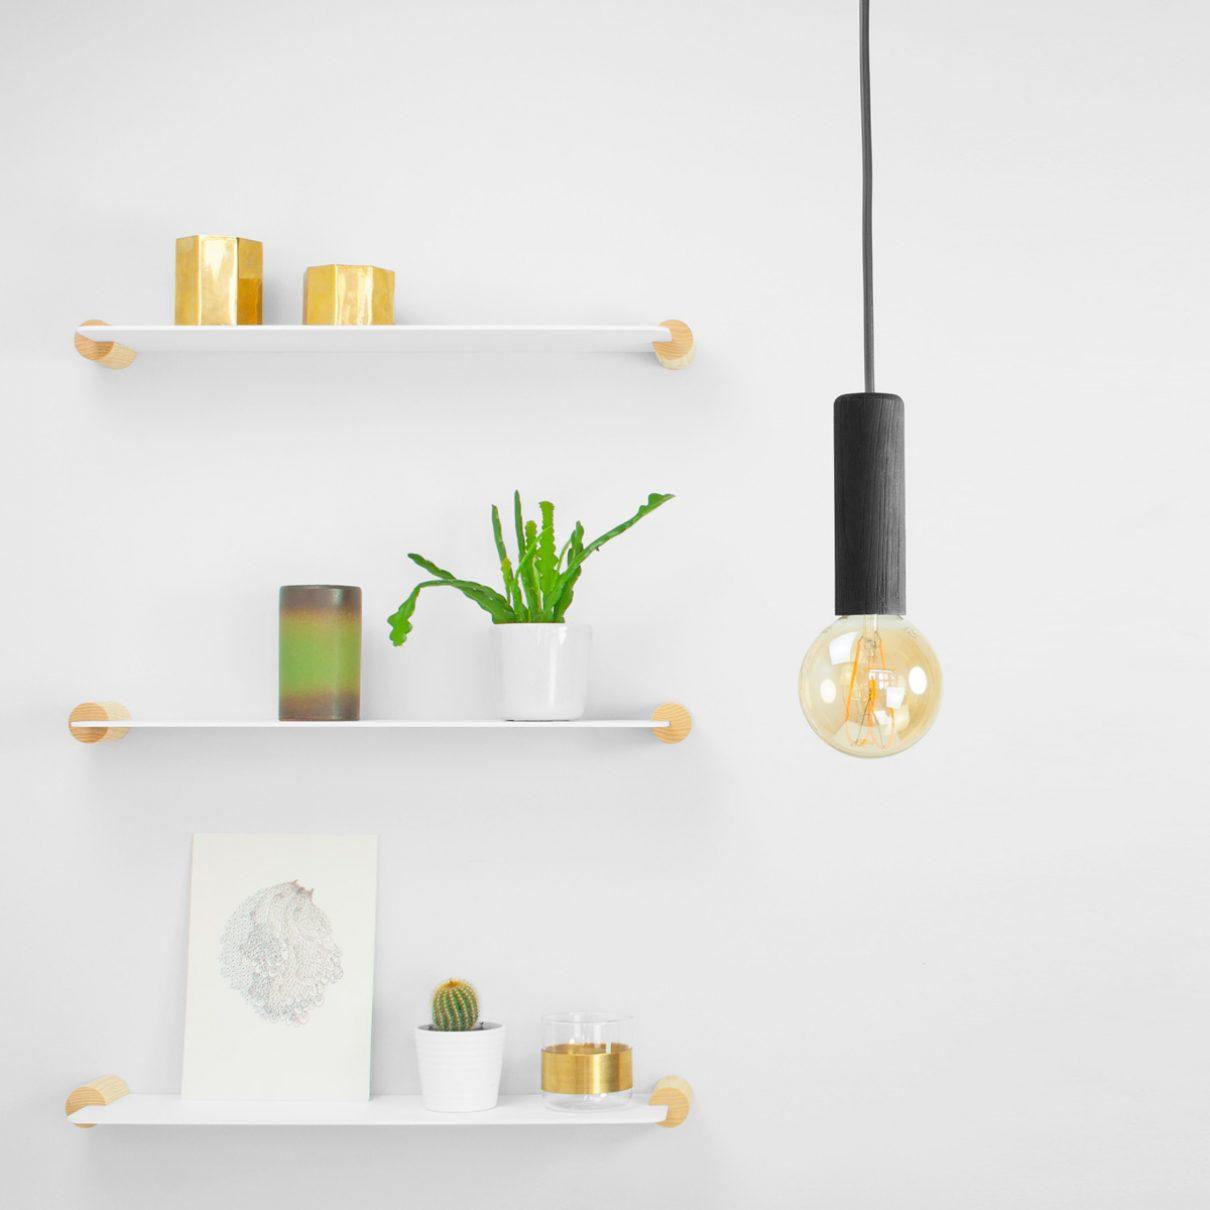 Mini hanglamp is mooi minimalisme met dubbele functie